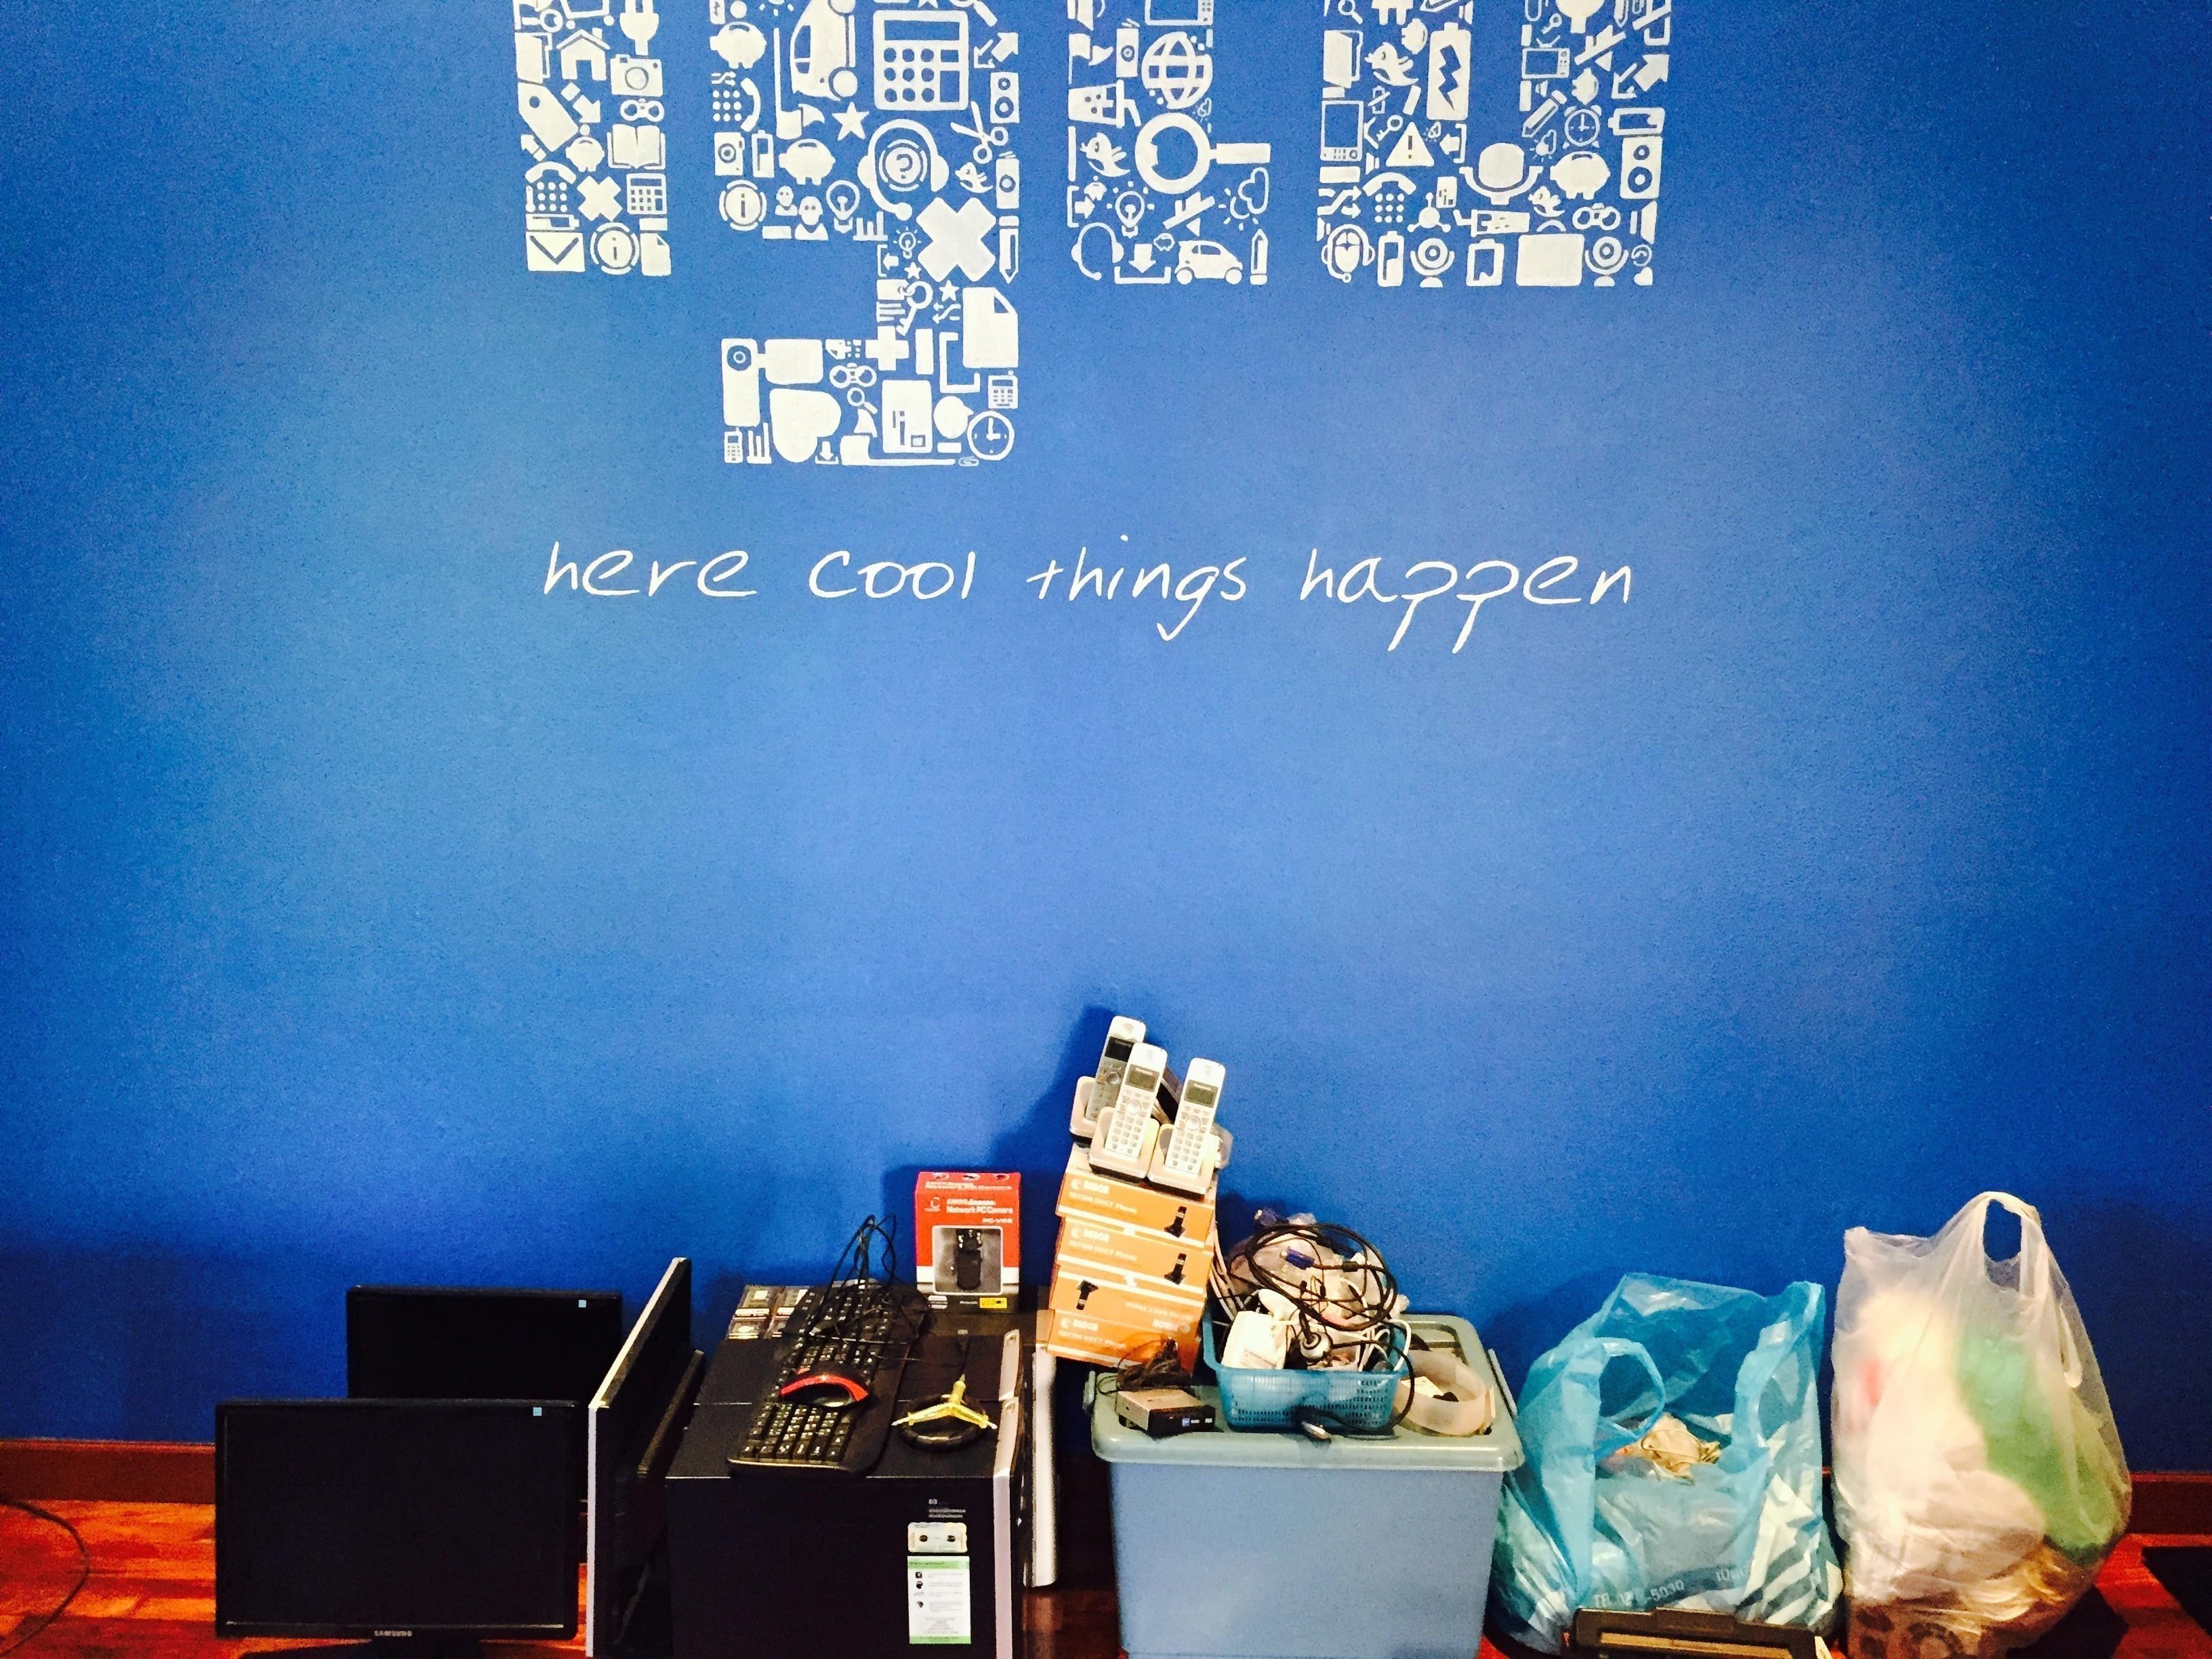 Iglu Tech Gear, Charity Spring Clean